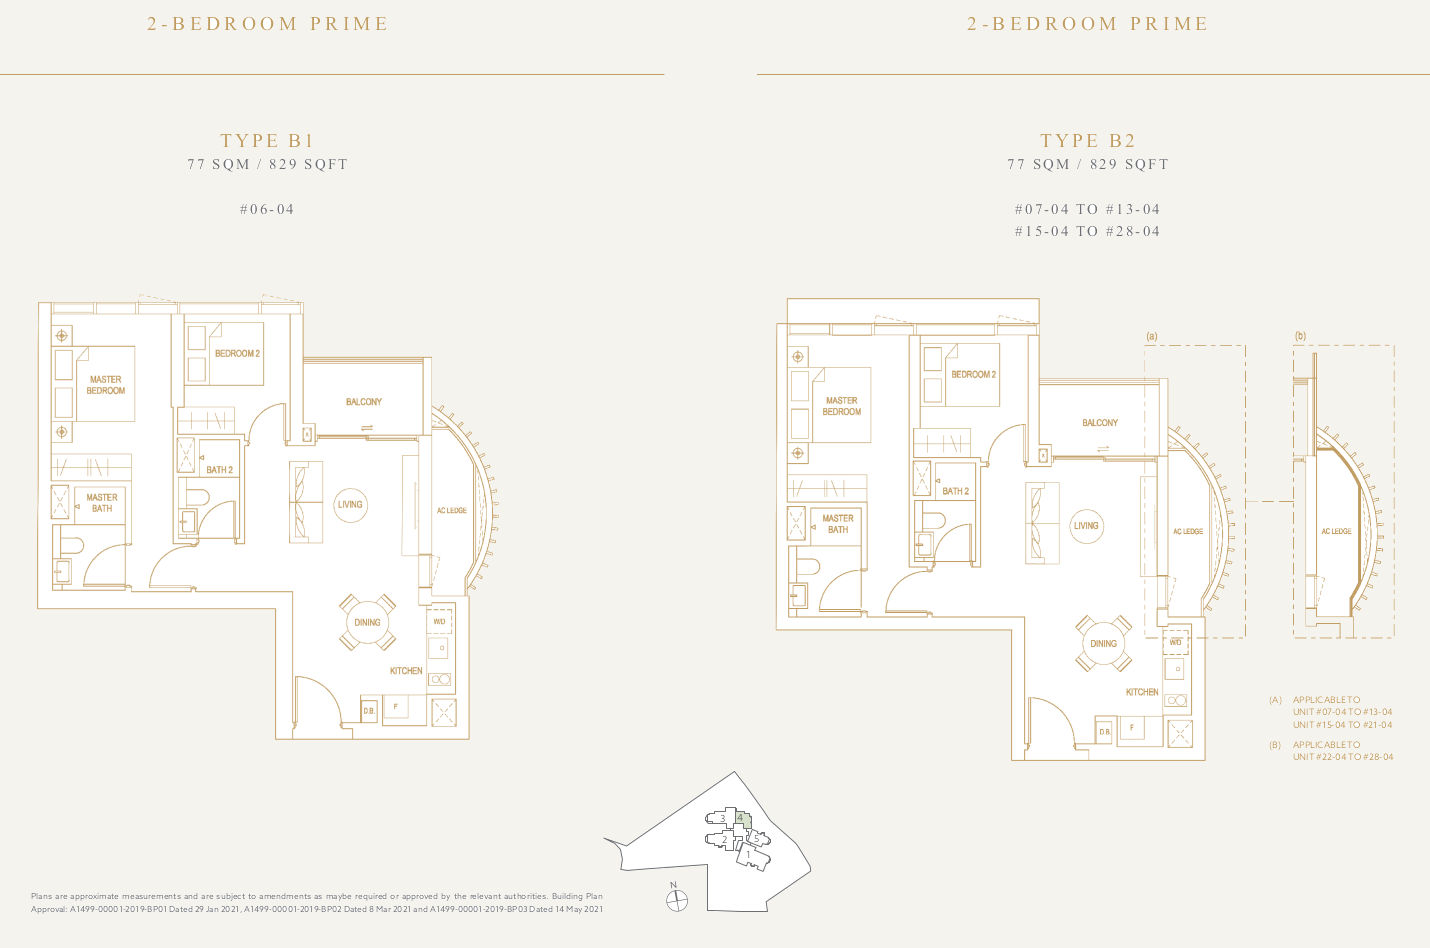 Klimt Cairnhill Floor Plan . 2BR Prime Type B1